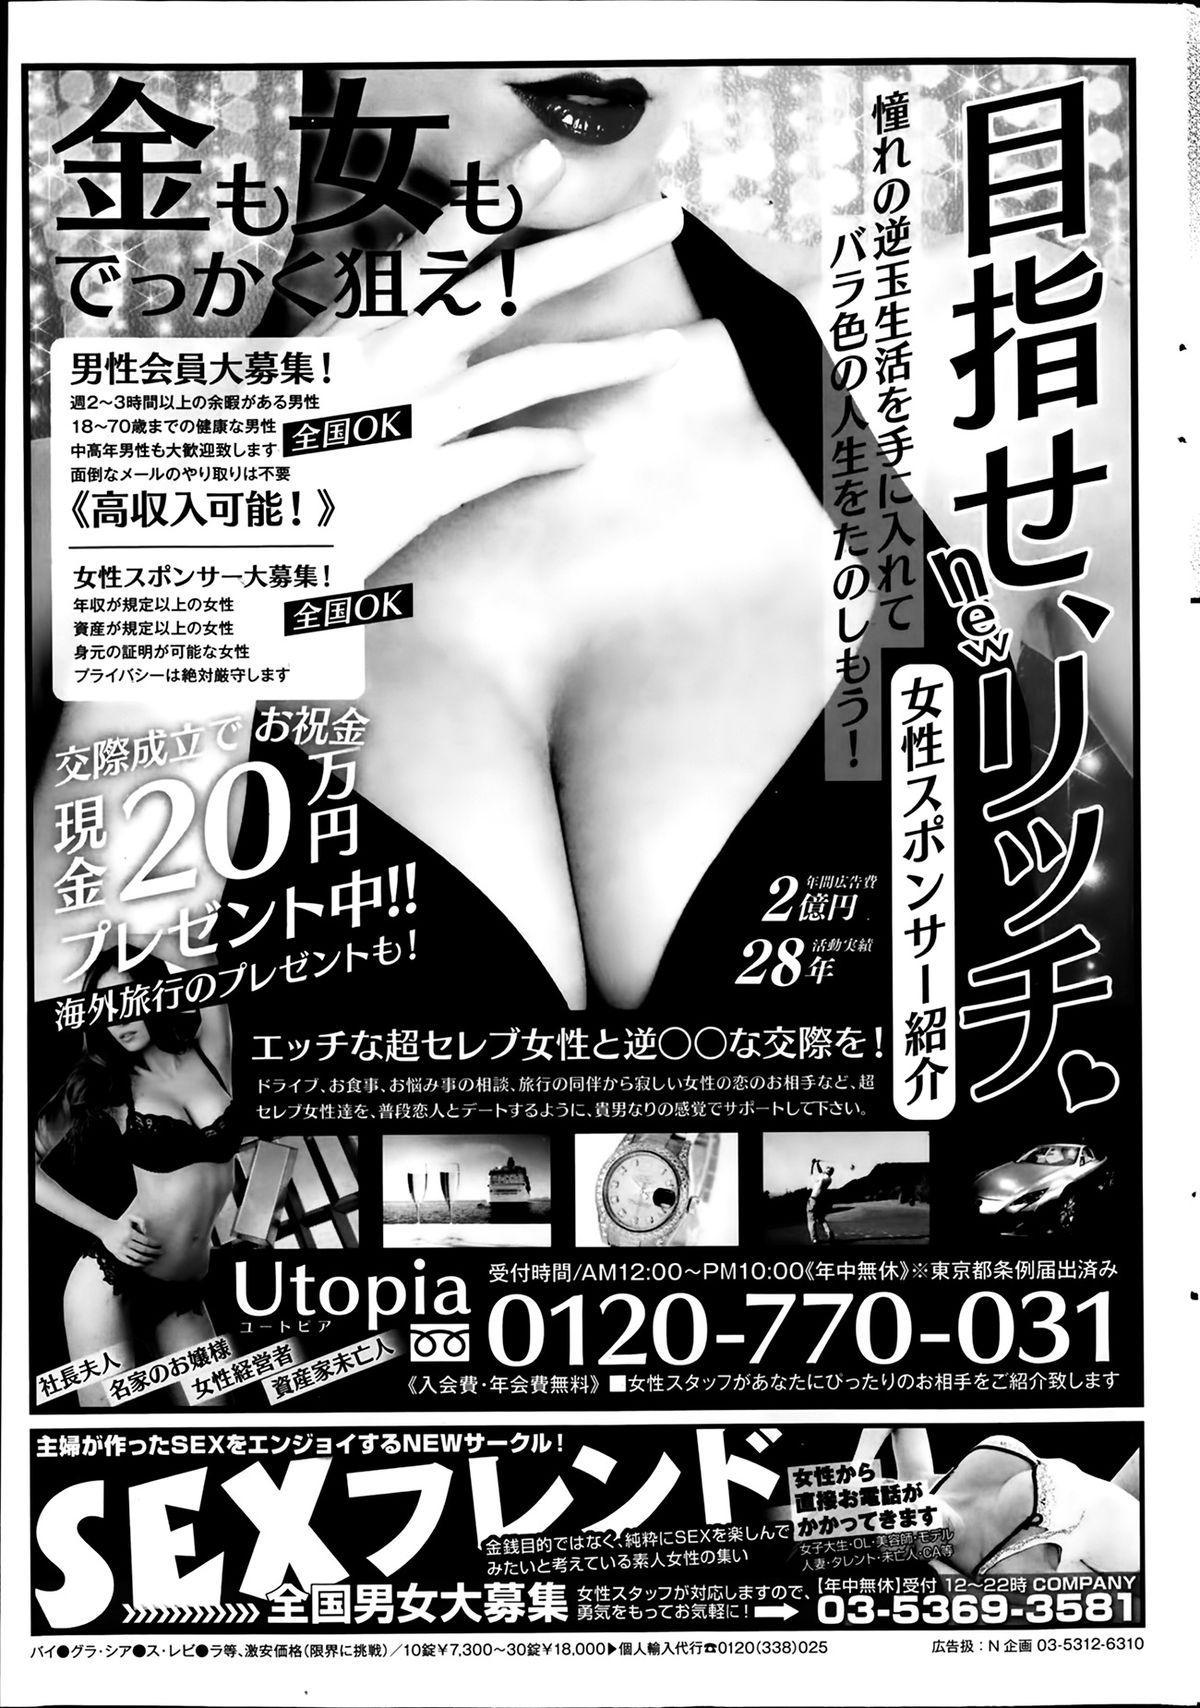 COMIC SIGMA 2014-03 Vol.78 263